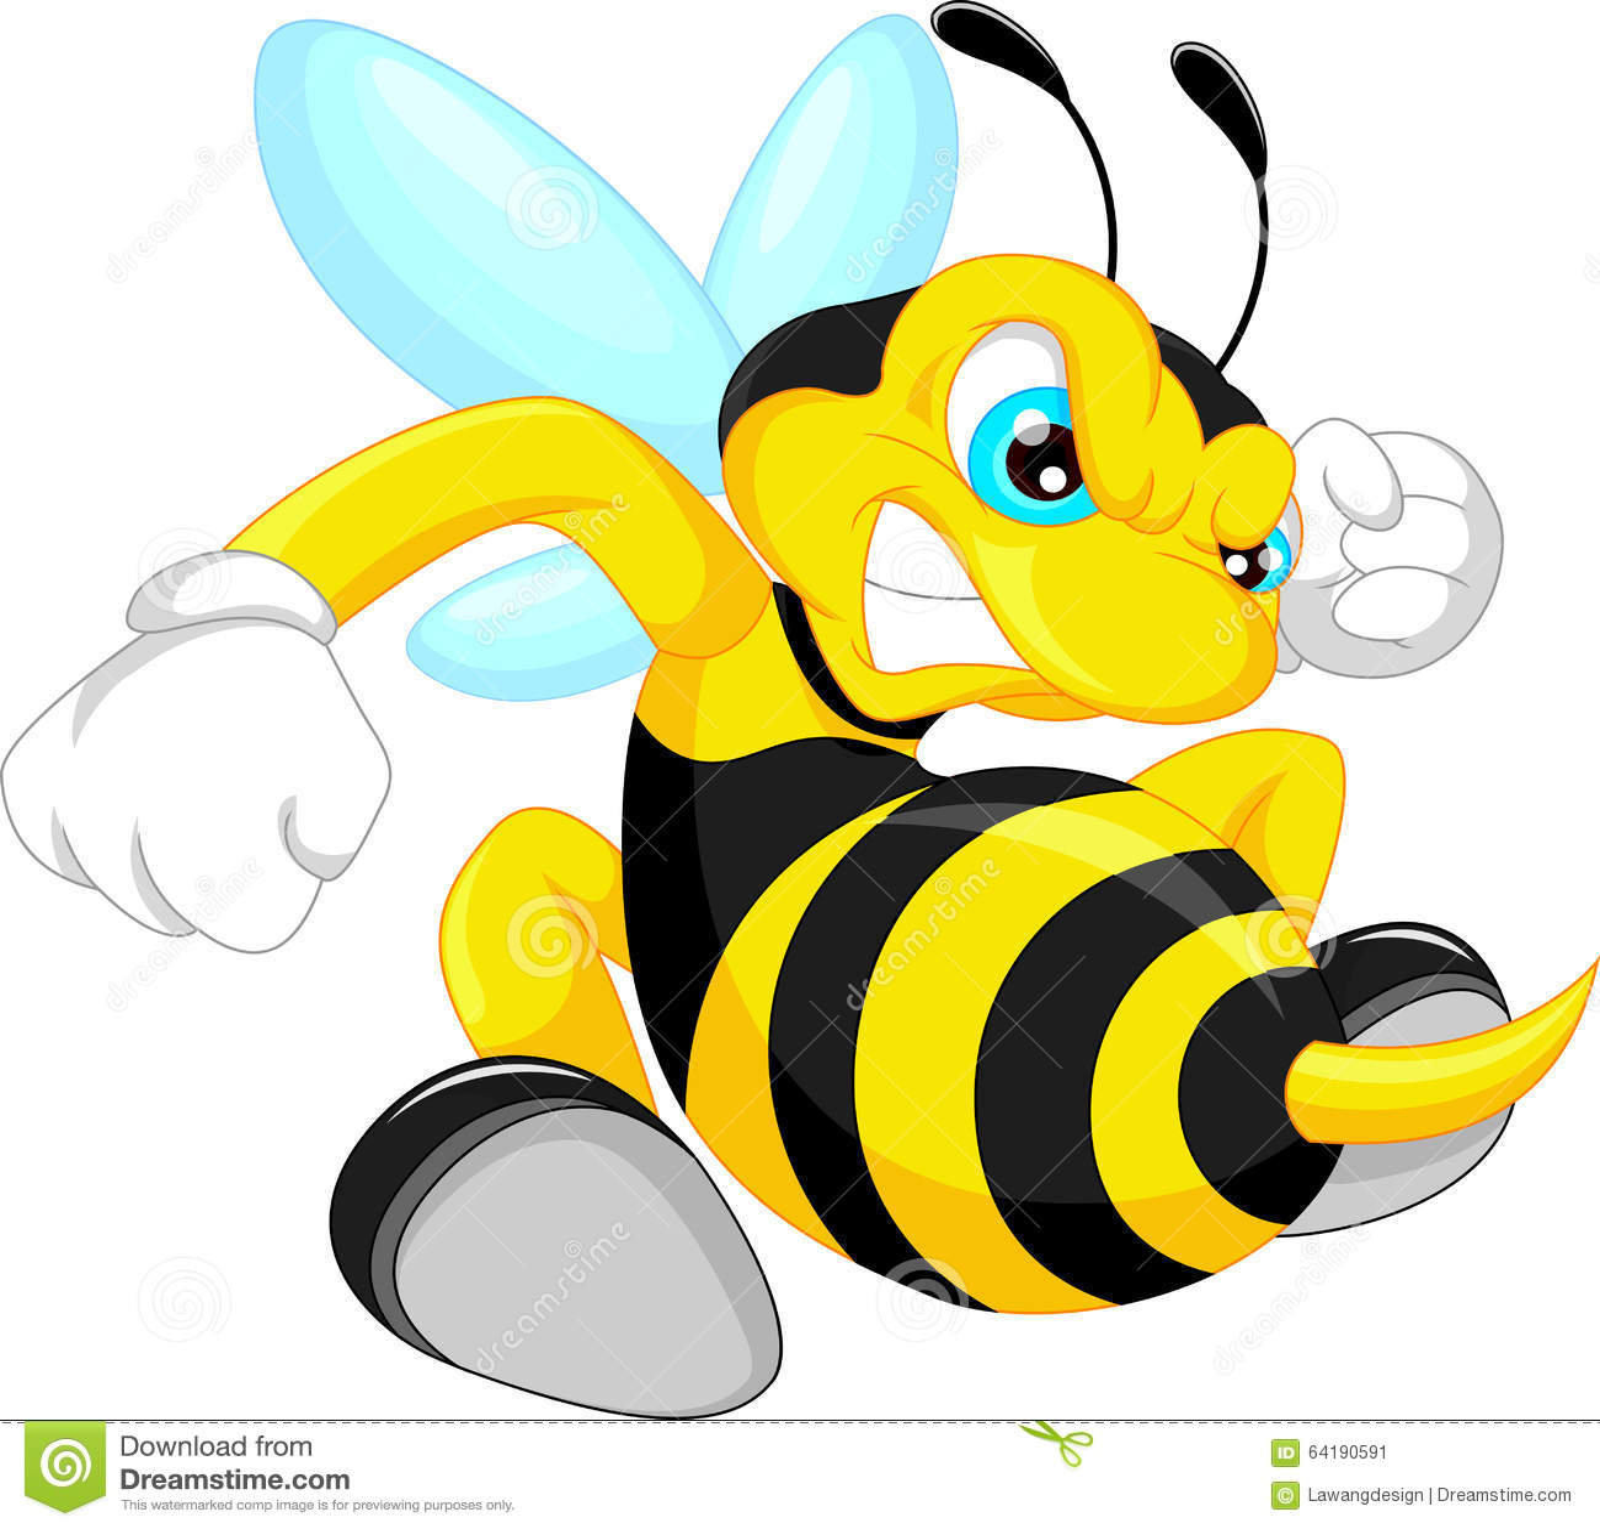 Angry Bee Cartoon Stock Vector